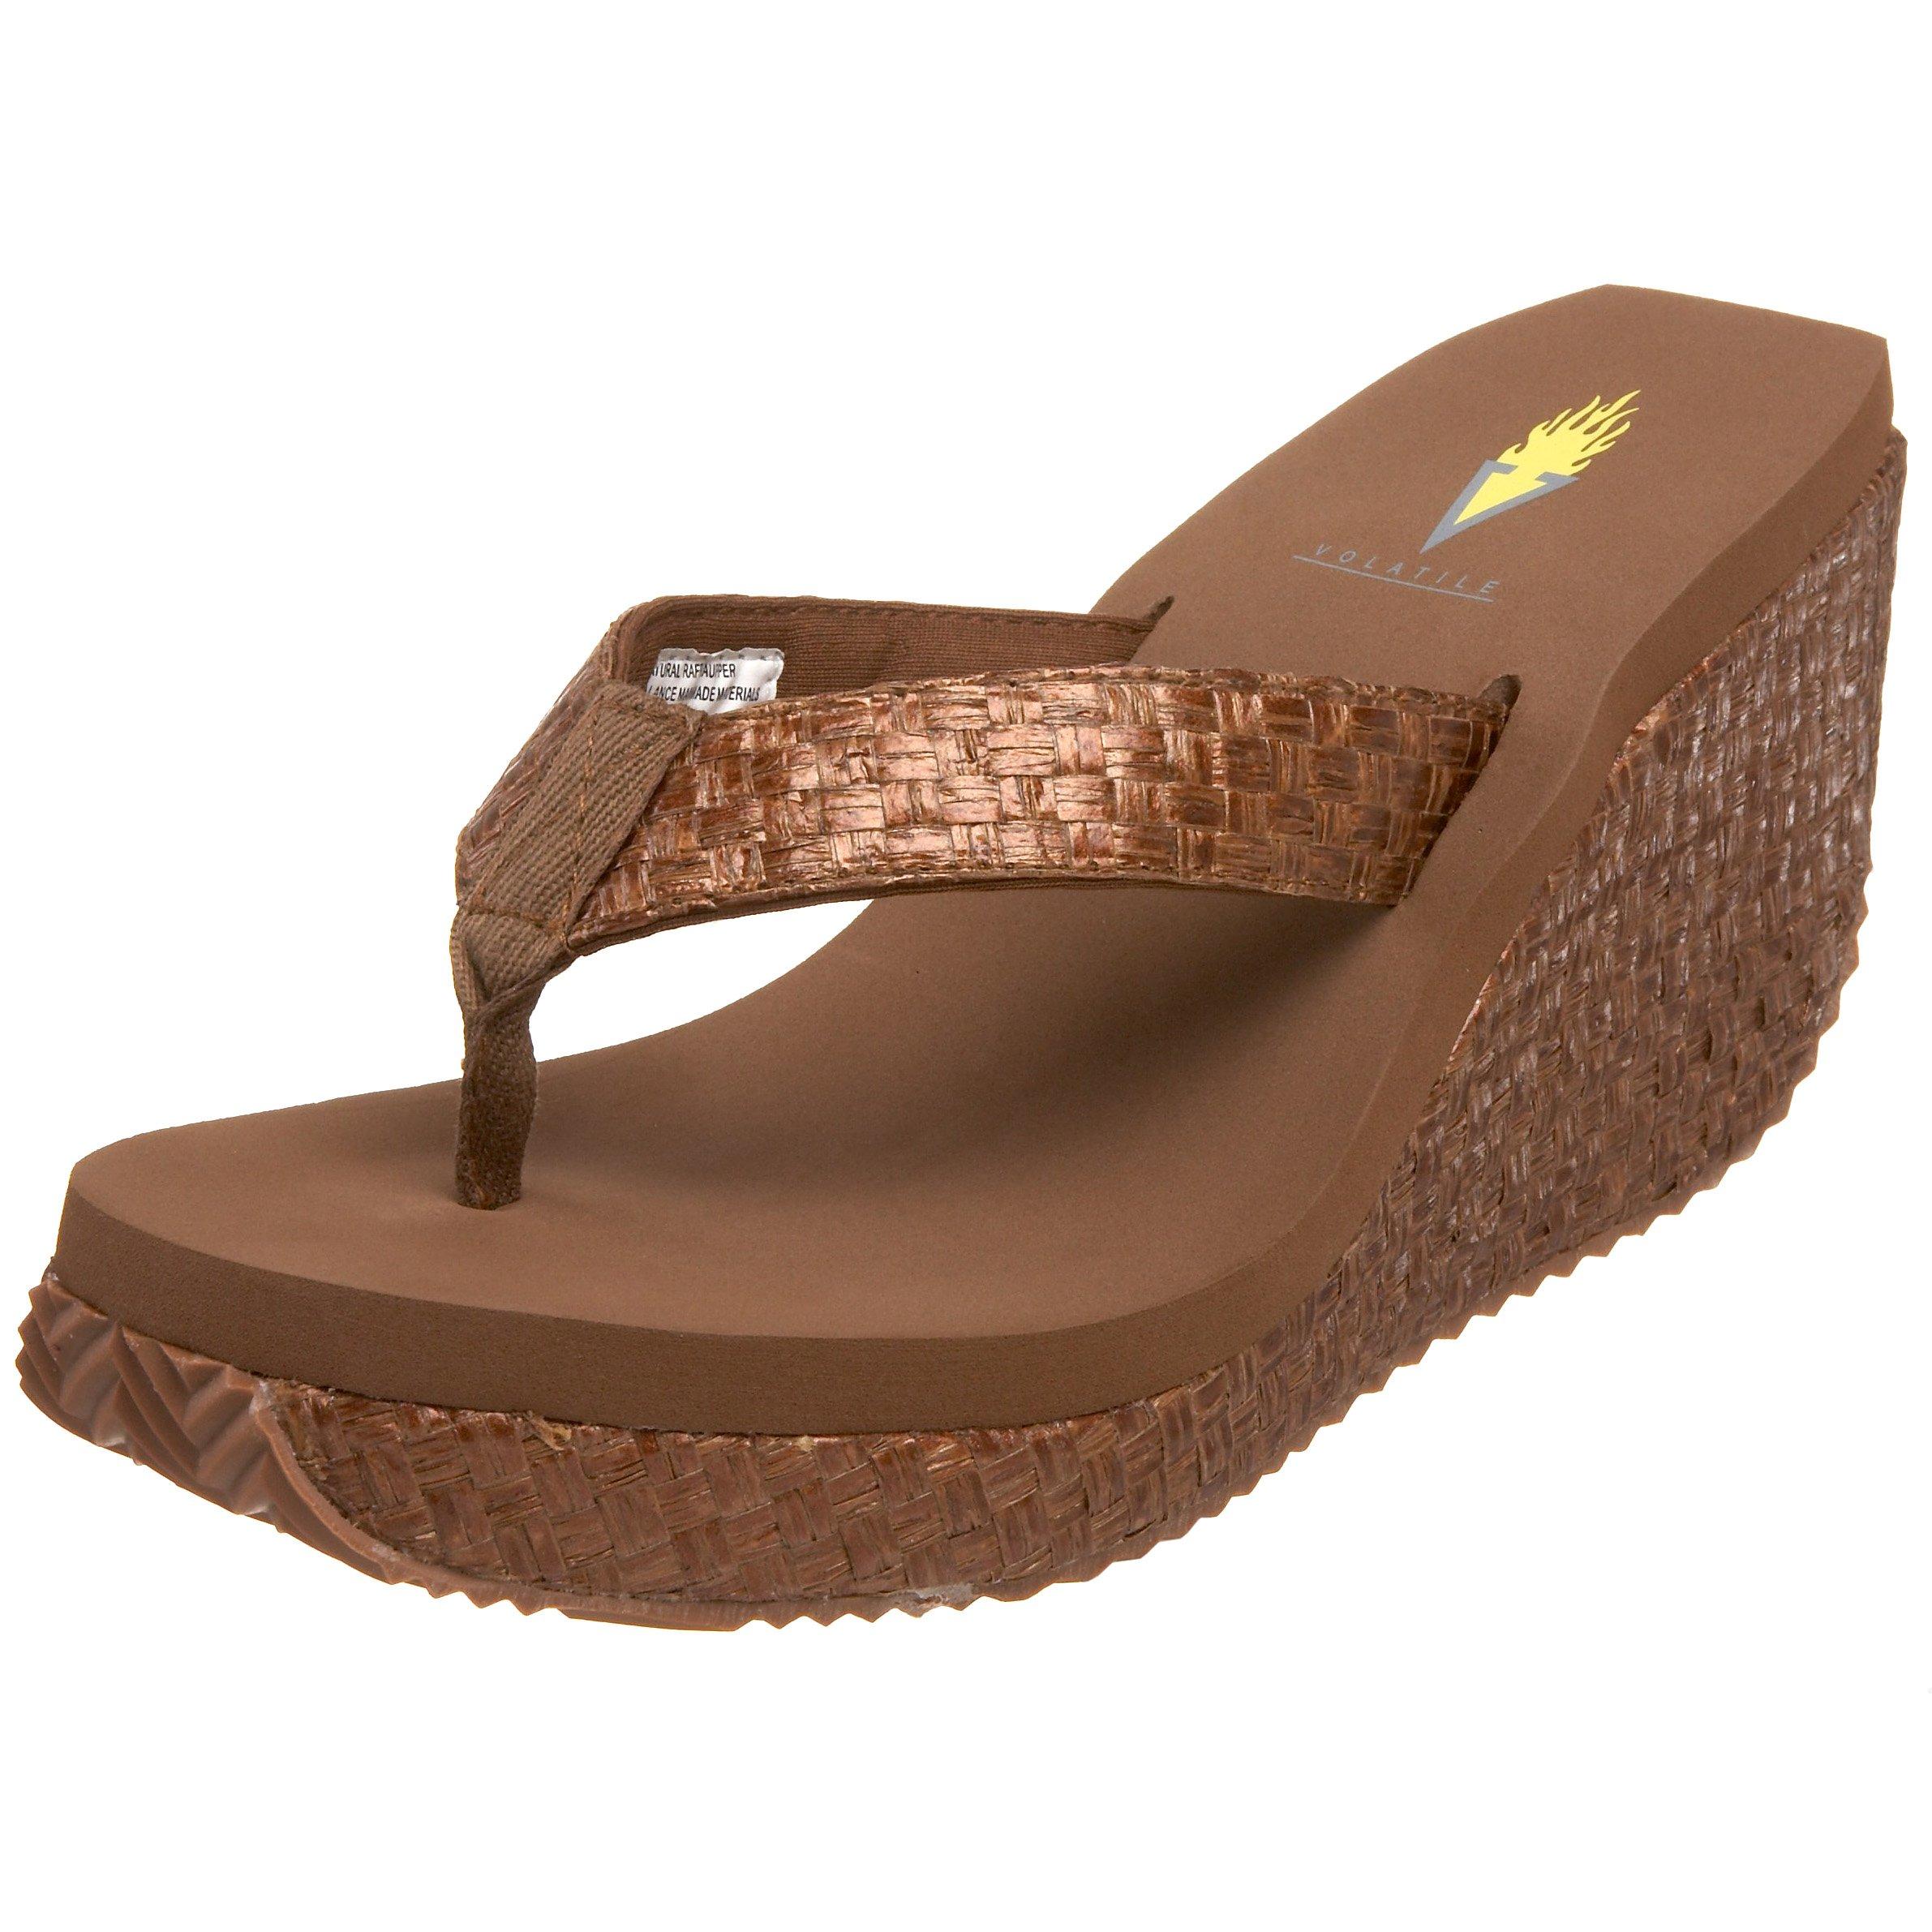 Volatile Women's Cha-Ching Wedge Sandal,Bronze,7 M US